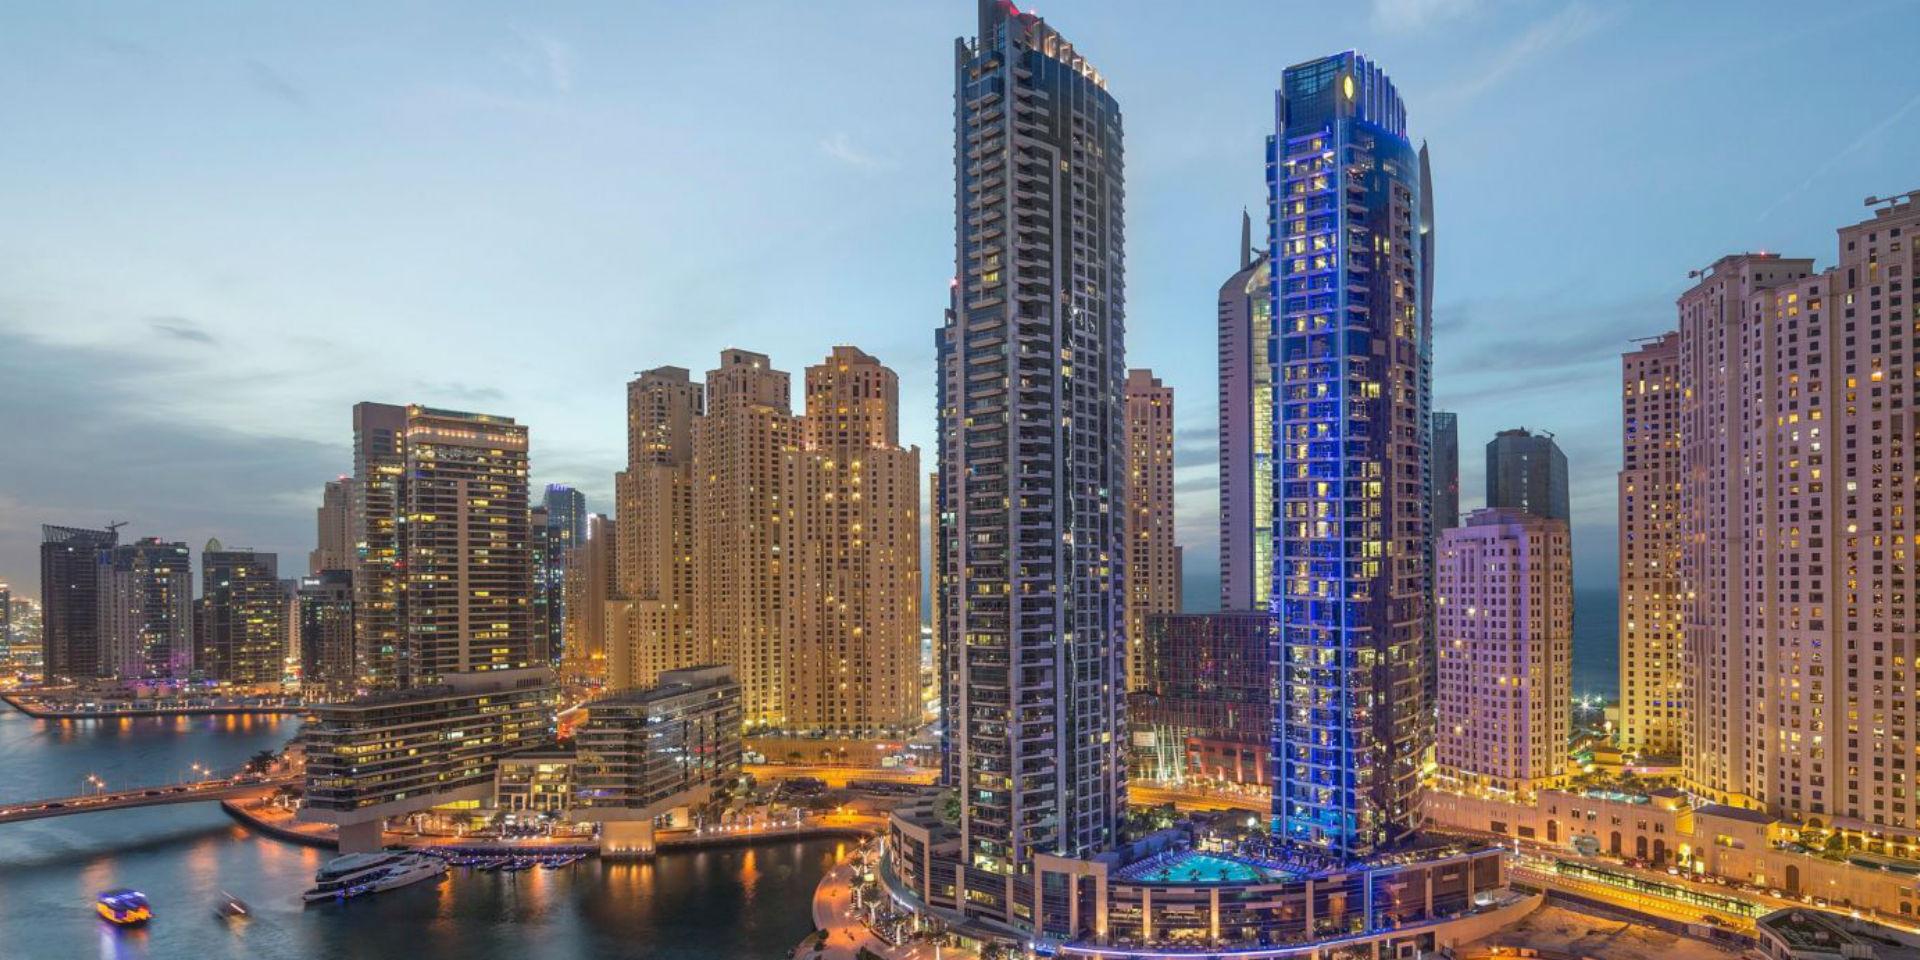 Dubai revolutionizes the urban environment with unique for Unusual hotels in dubai